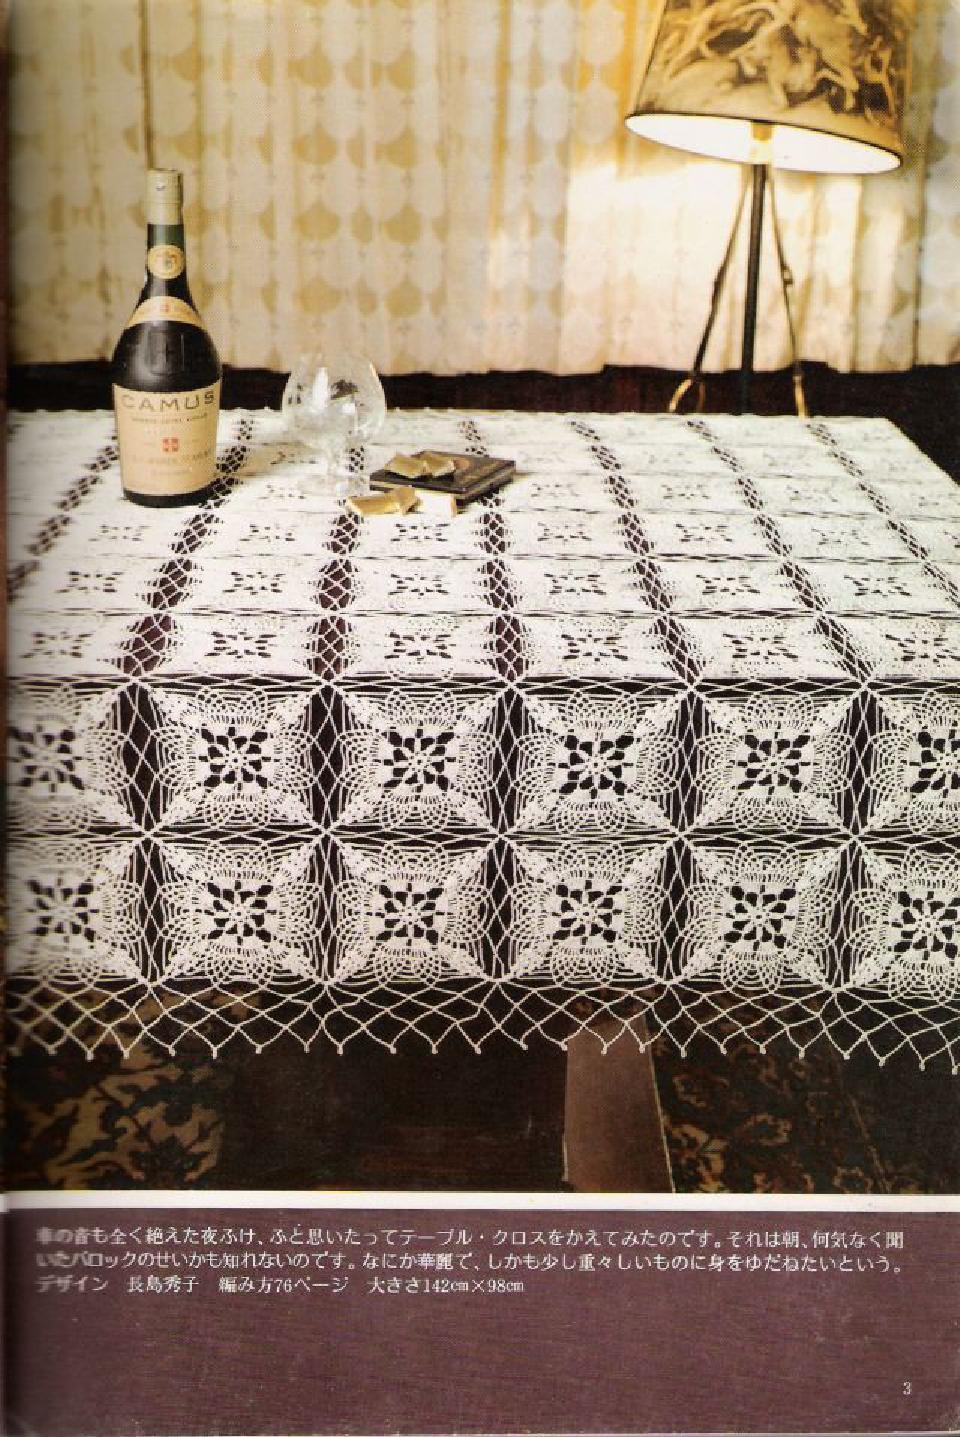 Patrones Gratis De Crochet Patrón Gratis A Crochet De Un Elegante Mantel Rectangular